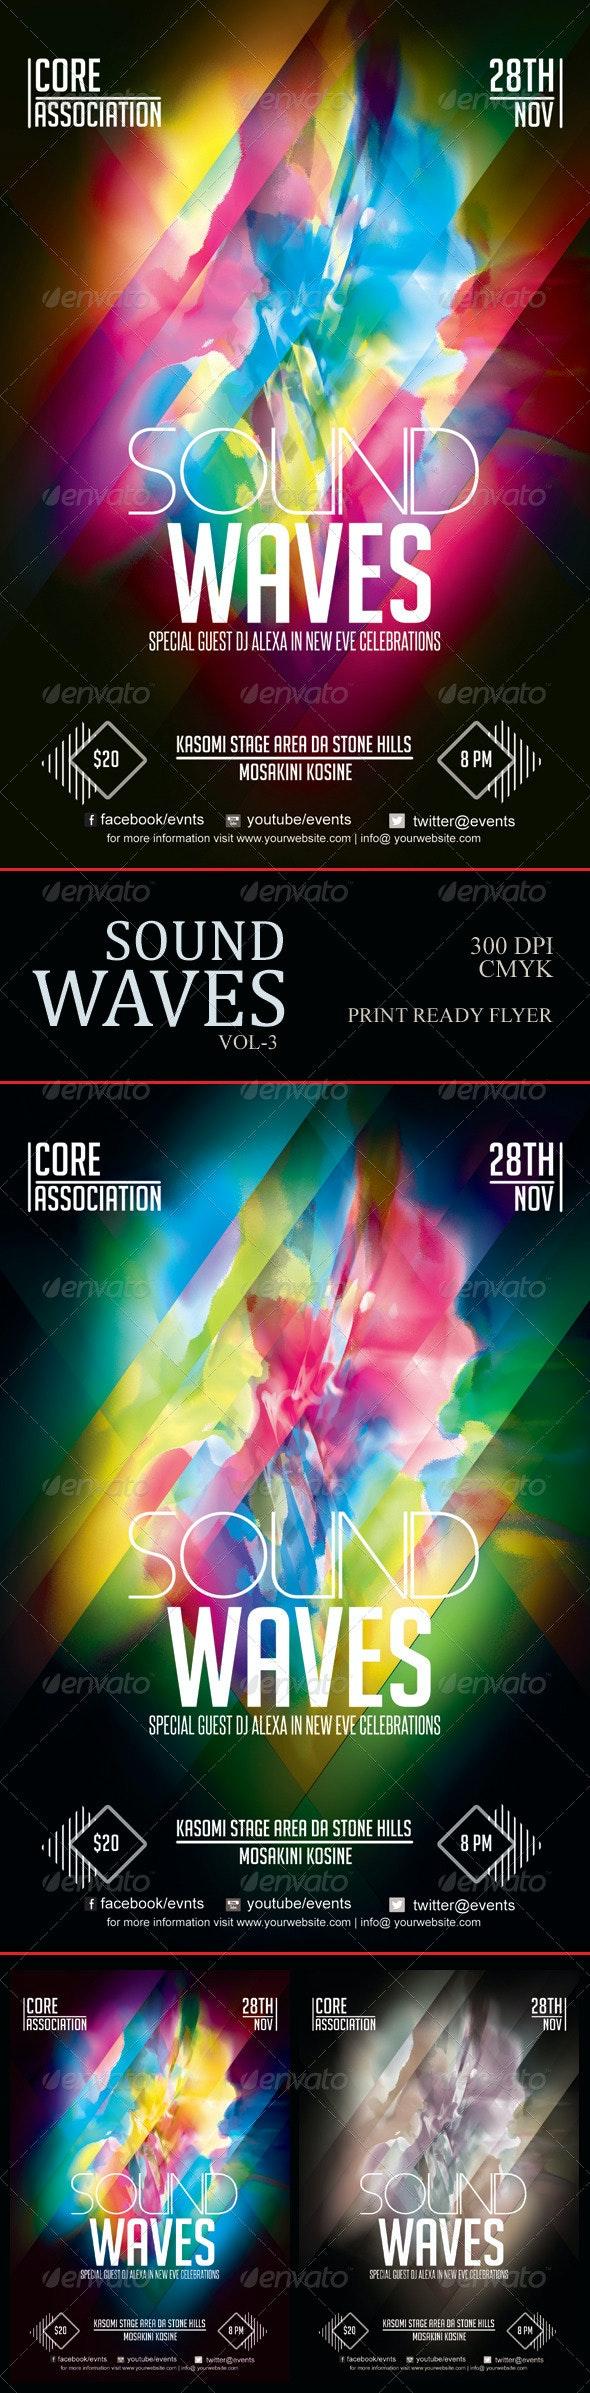 Sound Waves Flyer 3 - Concerts Events